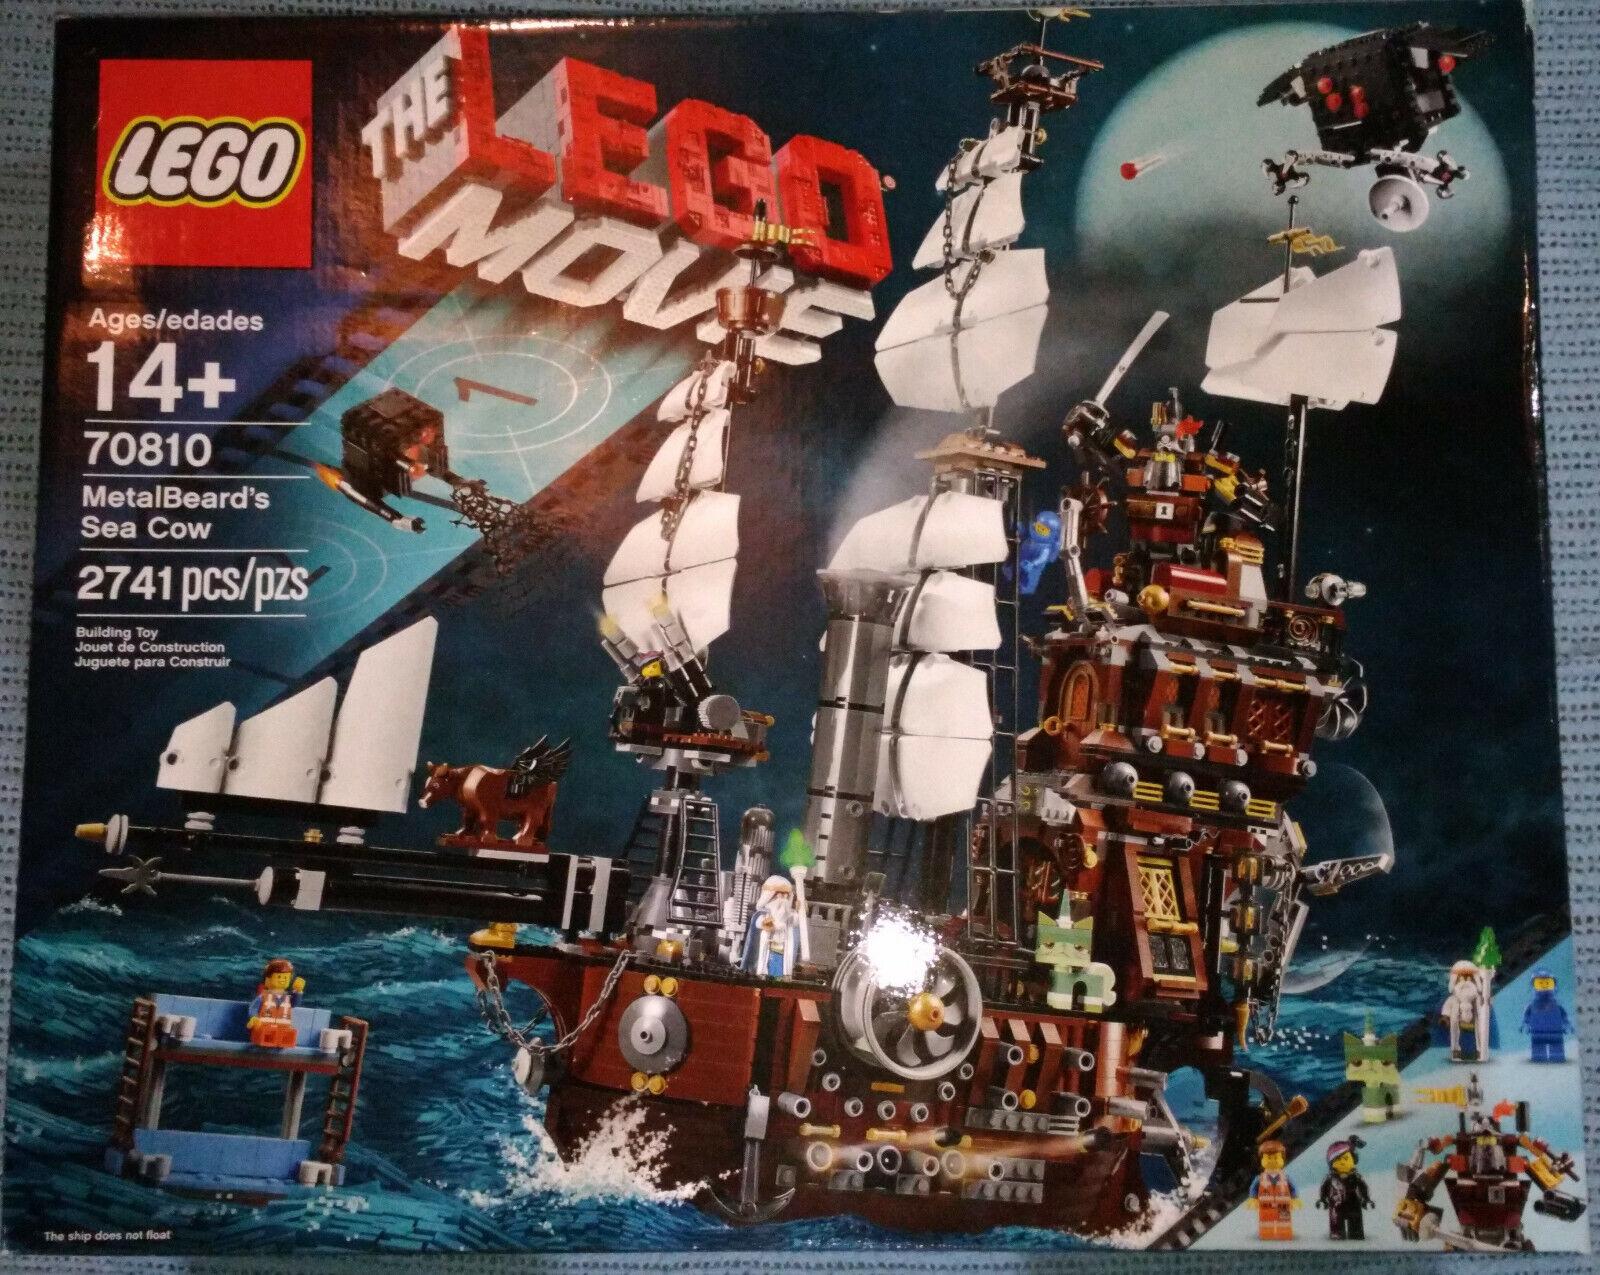 Movie Metalbeard's Cow70810Discontinued The Lego Sea ZwuPiOkTX